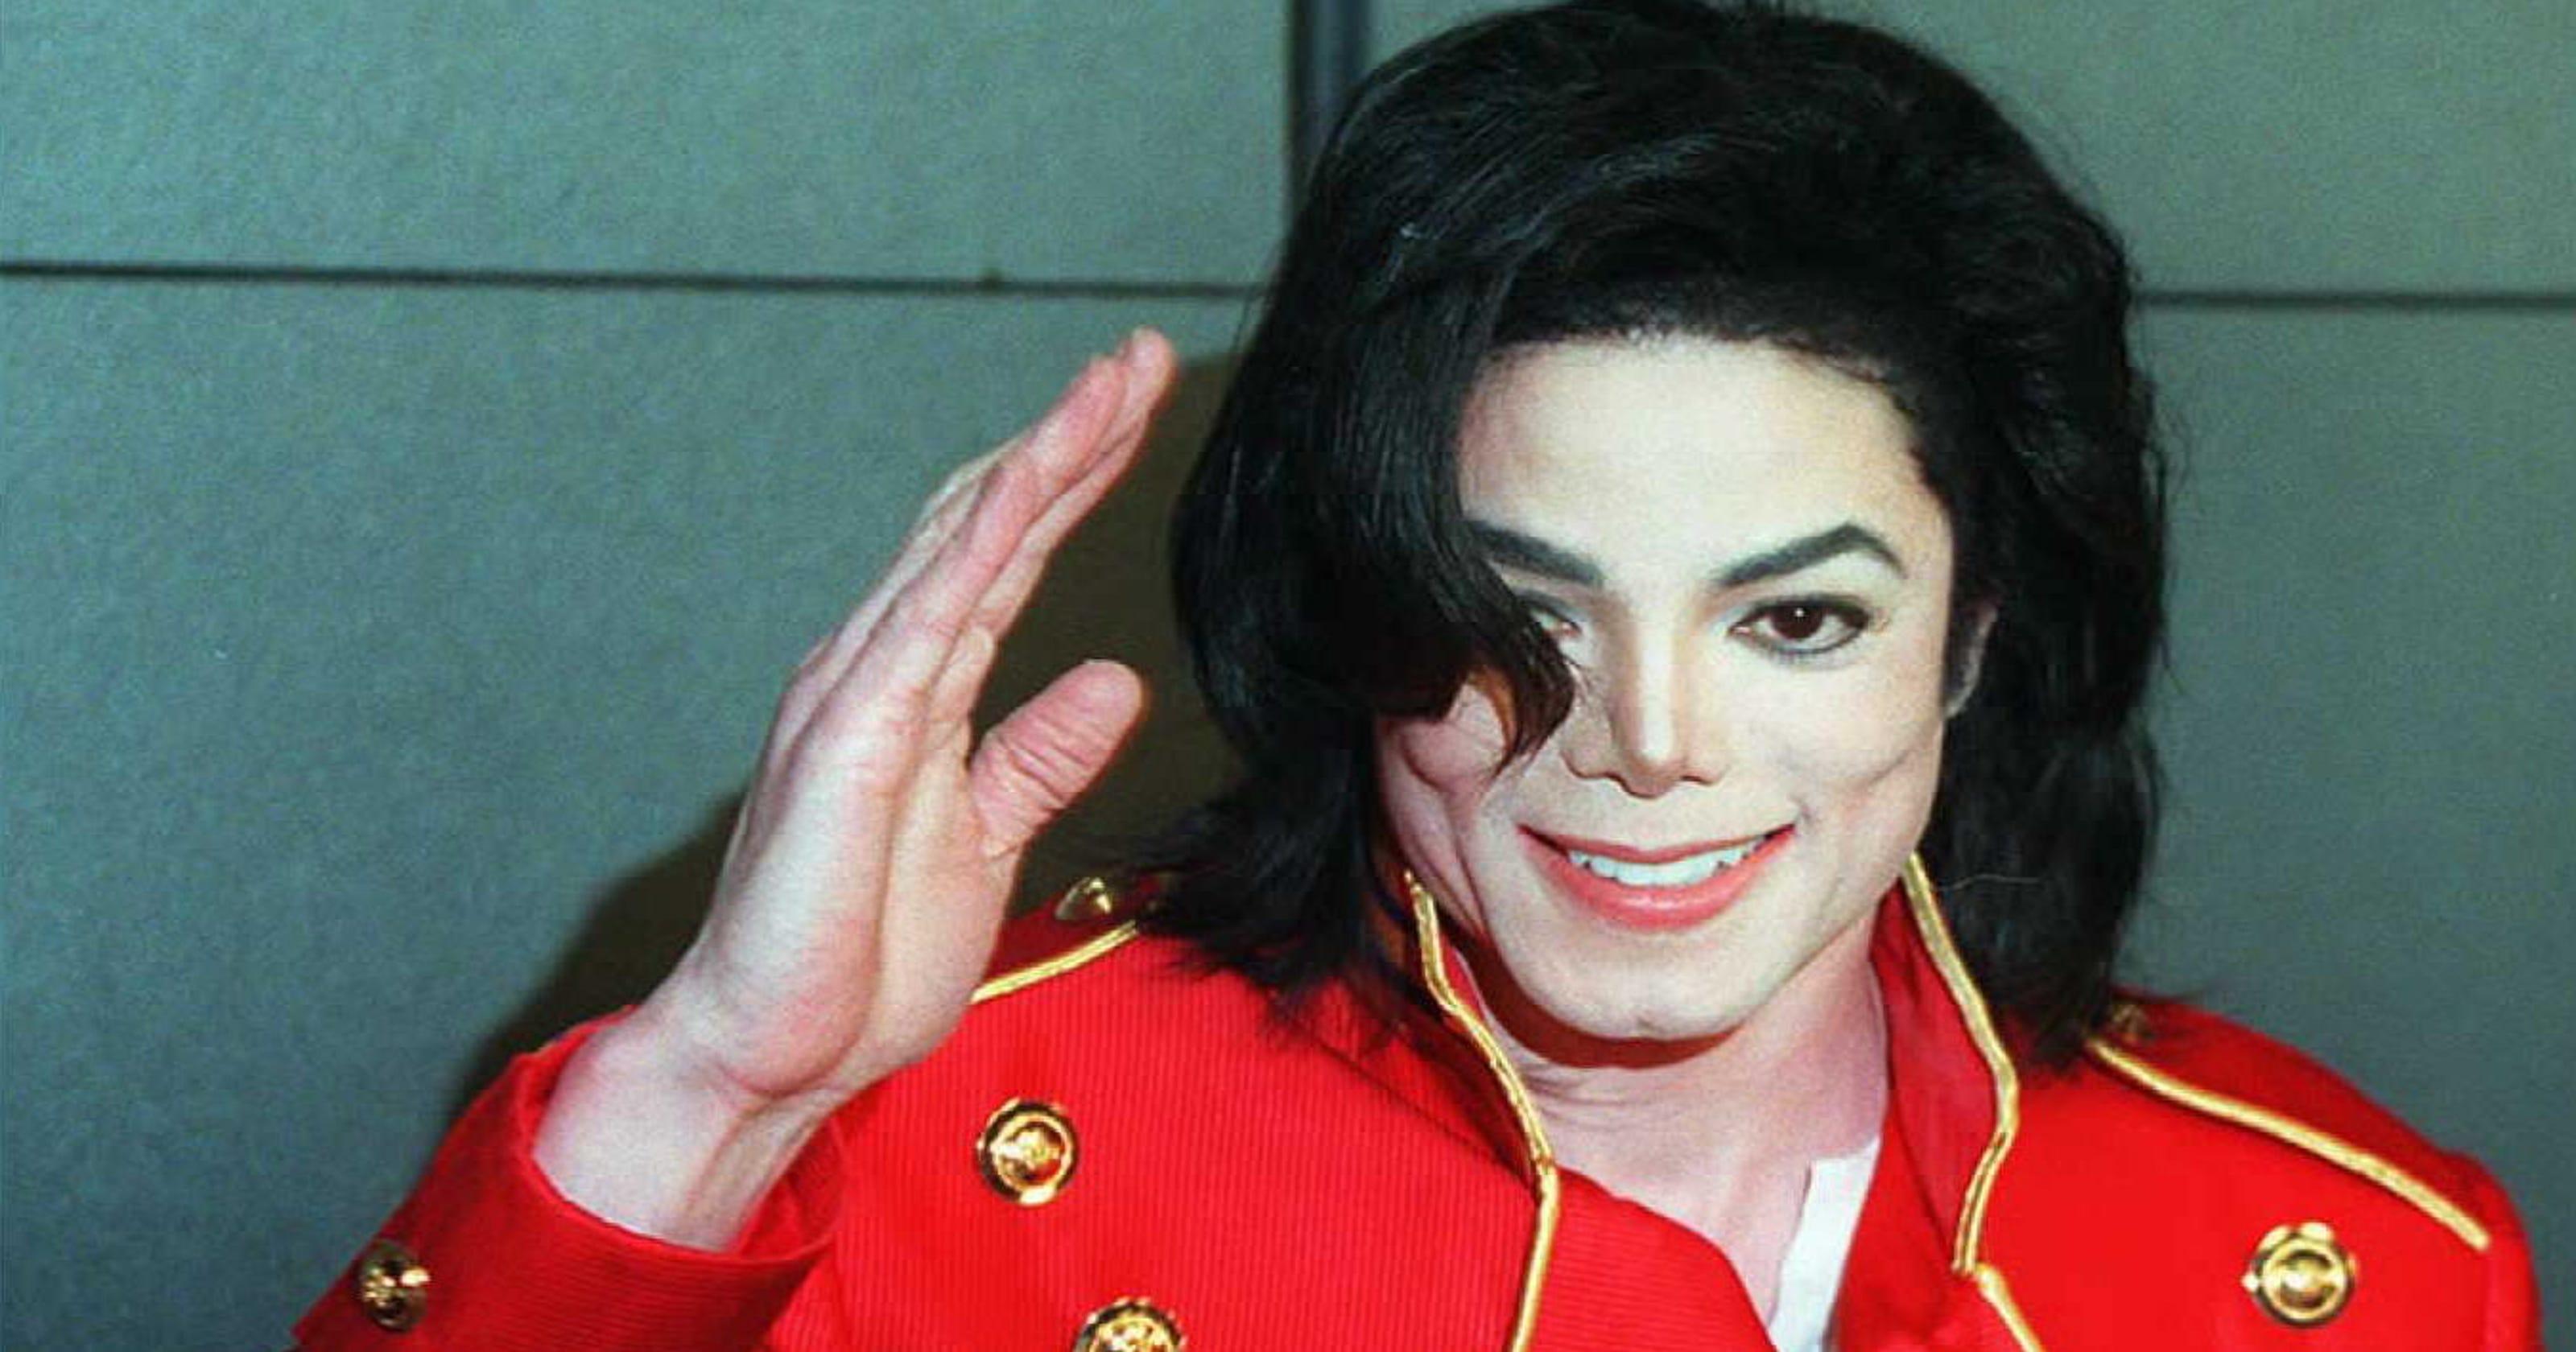 Superfan moonwalks back on his Michael Jackson name change following 'Leaving Neverland'